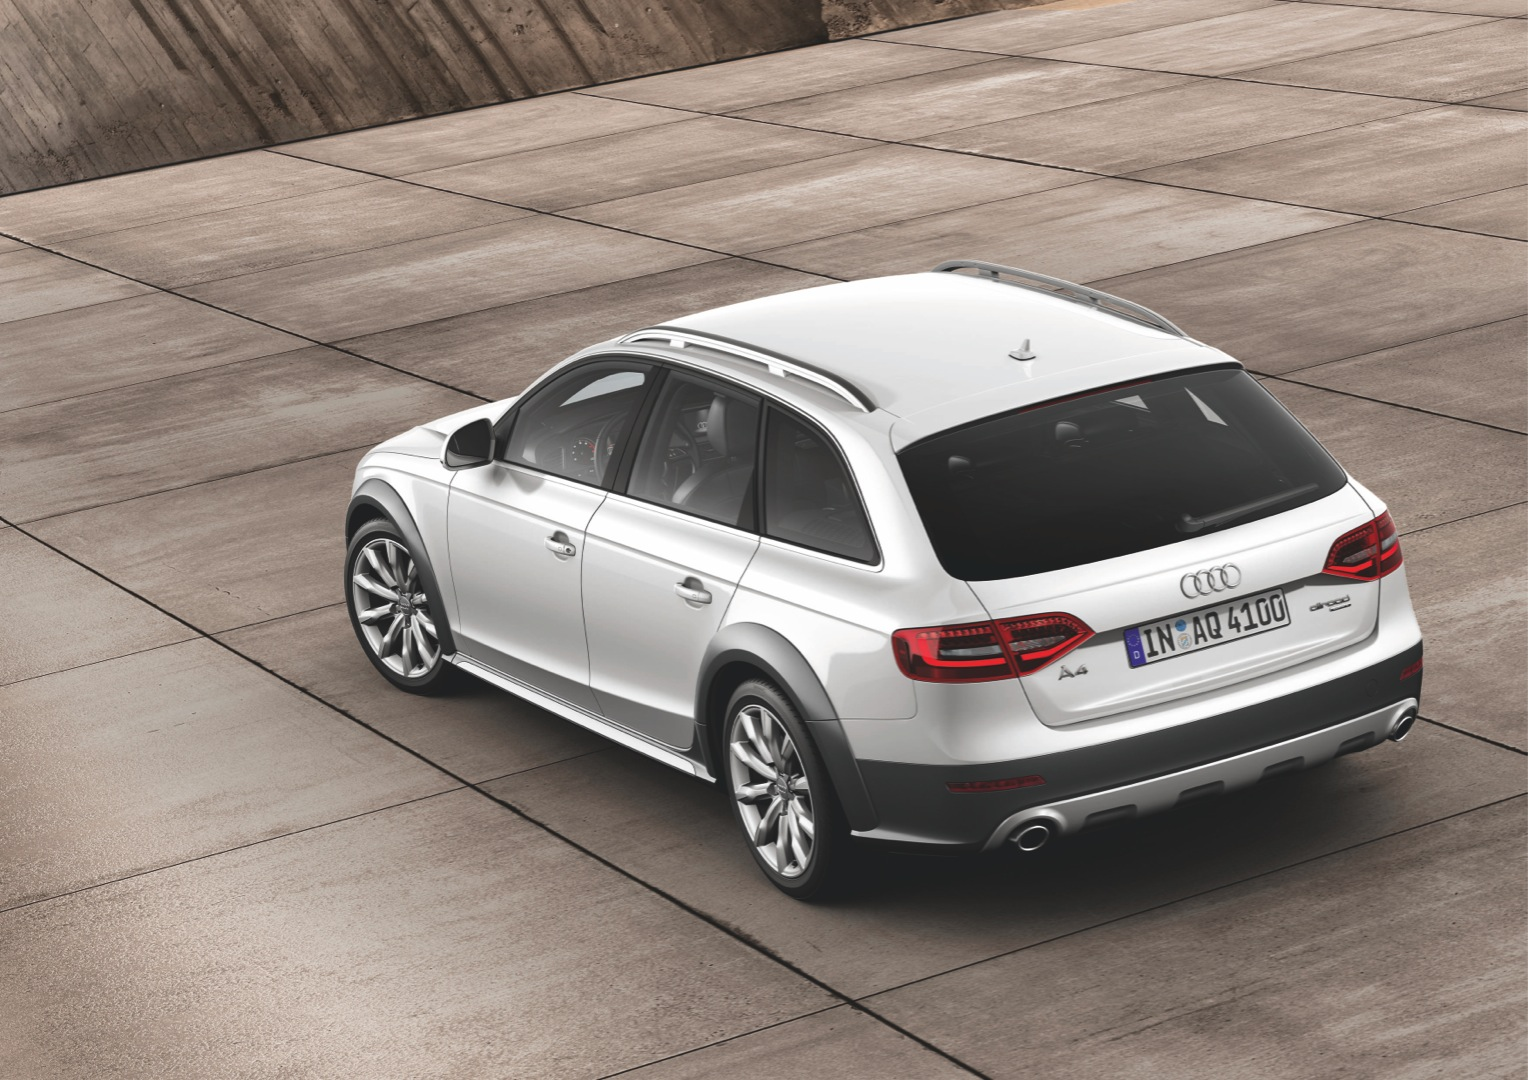 Audi A4 Allroad Specs Photos 2012 2013 2014 2015 2016 2017